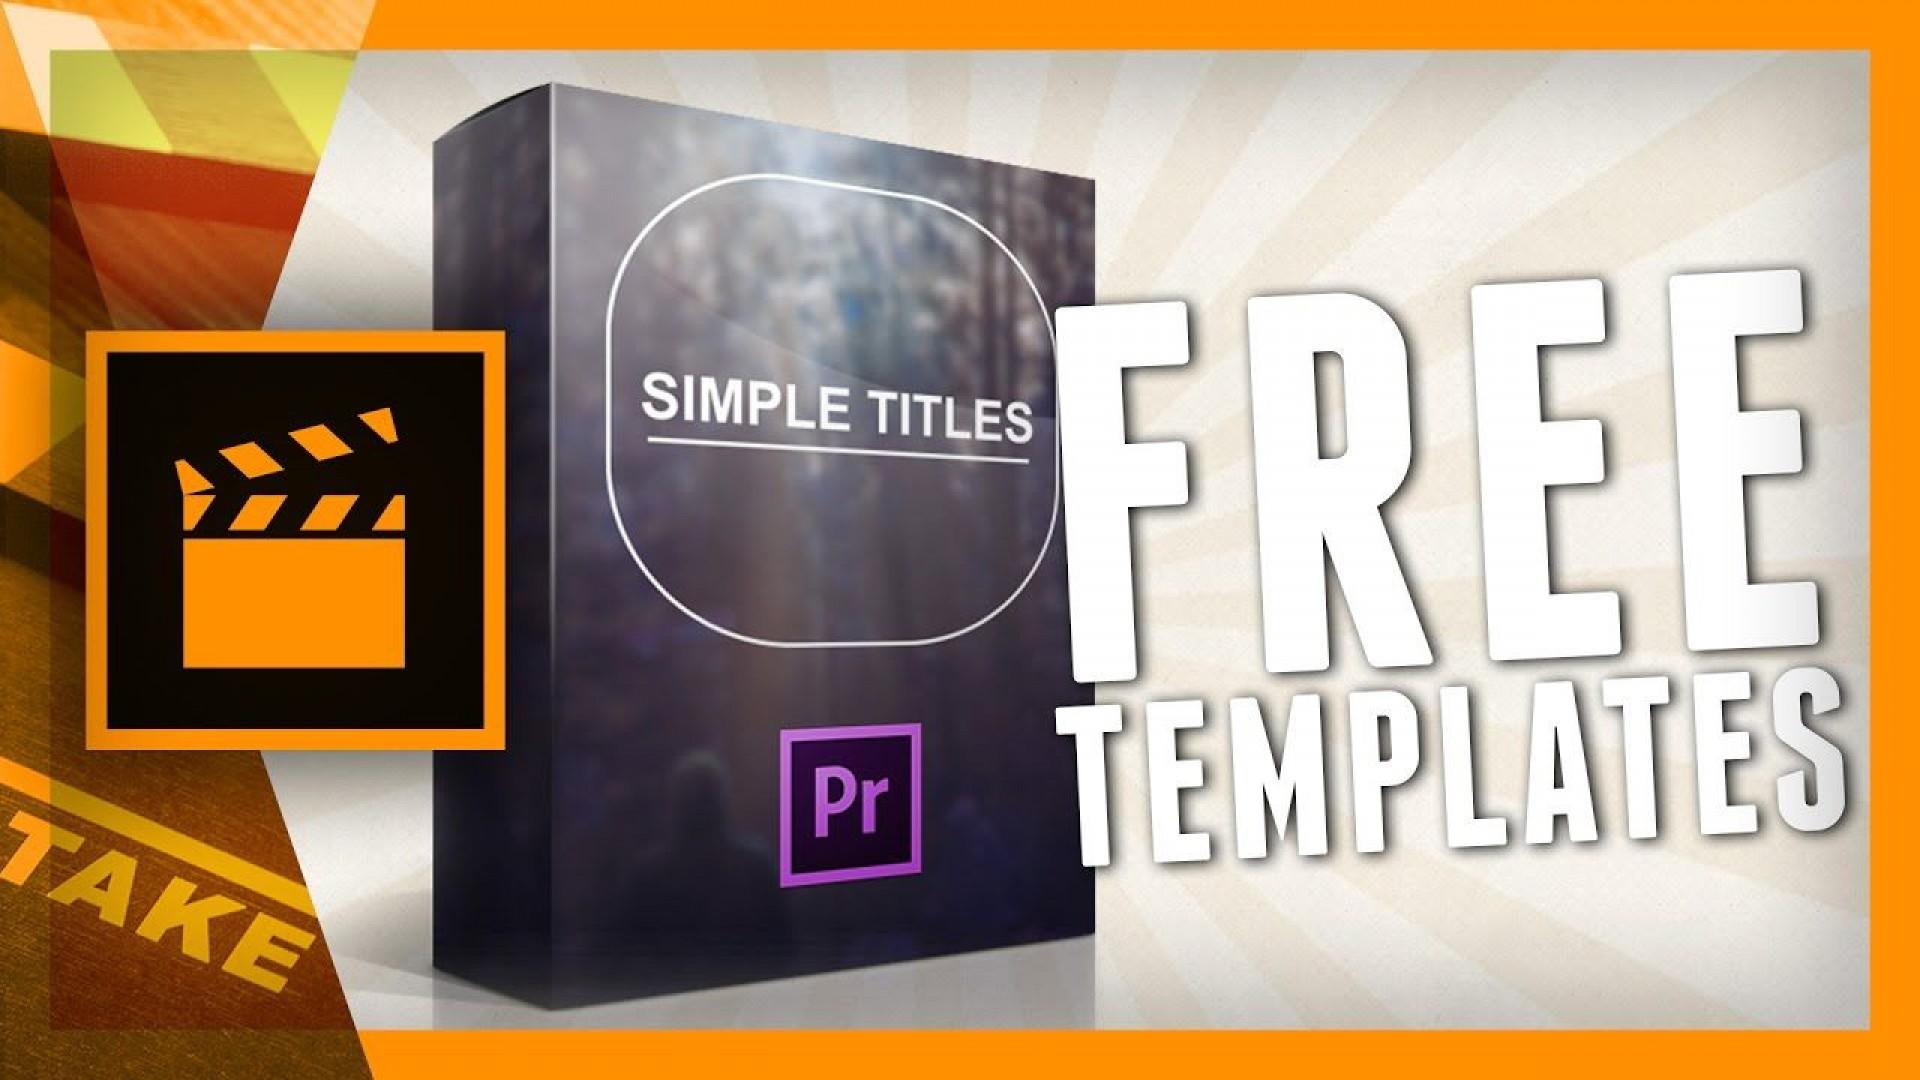 002 Astounding Free Adobe Premiere Template Sample  Templates Pro Intro Rush Wedding Video1920